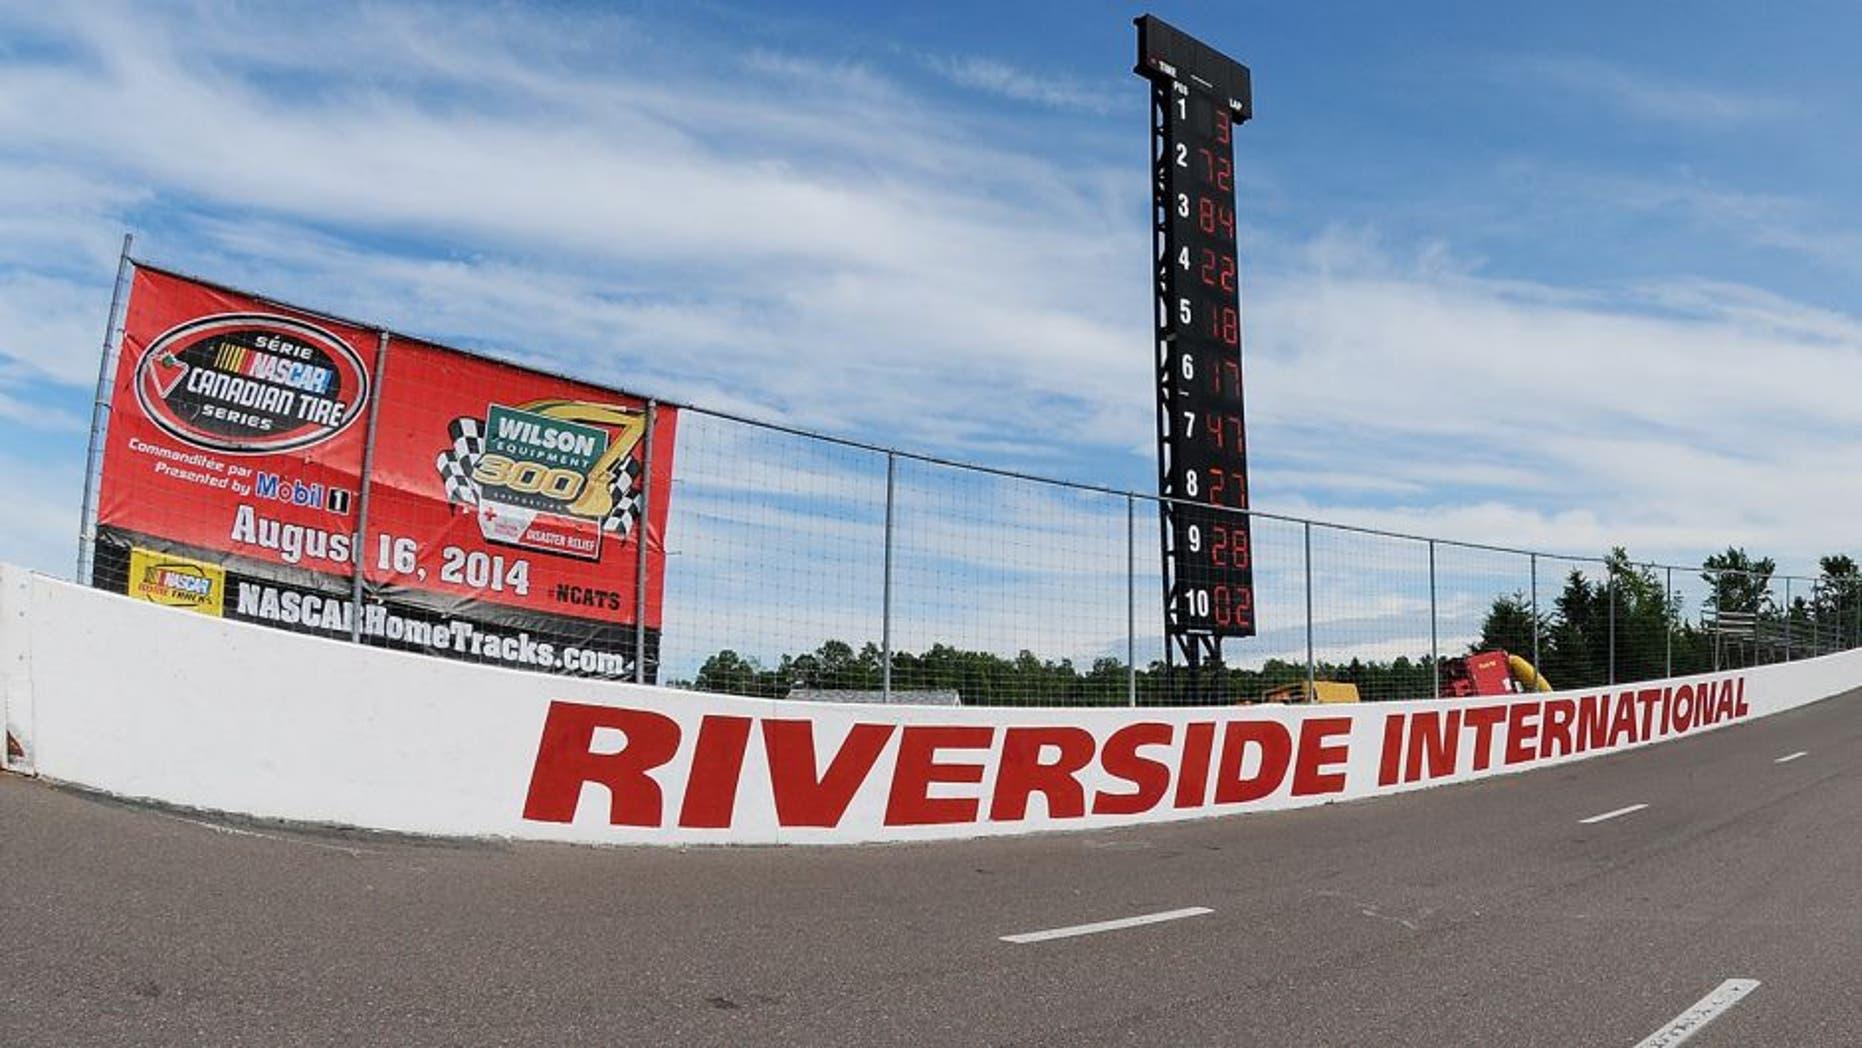 ANTIGONISH, NS - AUGUST 16: The Wilson Equipment 300 at Riverside International Speedway on August 16, 2014 in Antigonish, Nova Scotia, Canada. (Photo by Matthew Murnaghan/NASCAR via Getty Images)